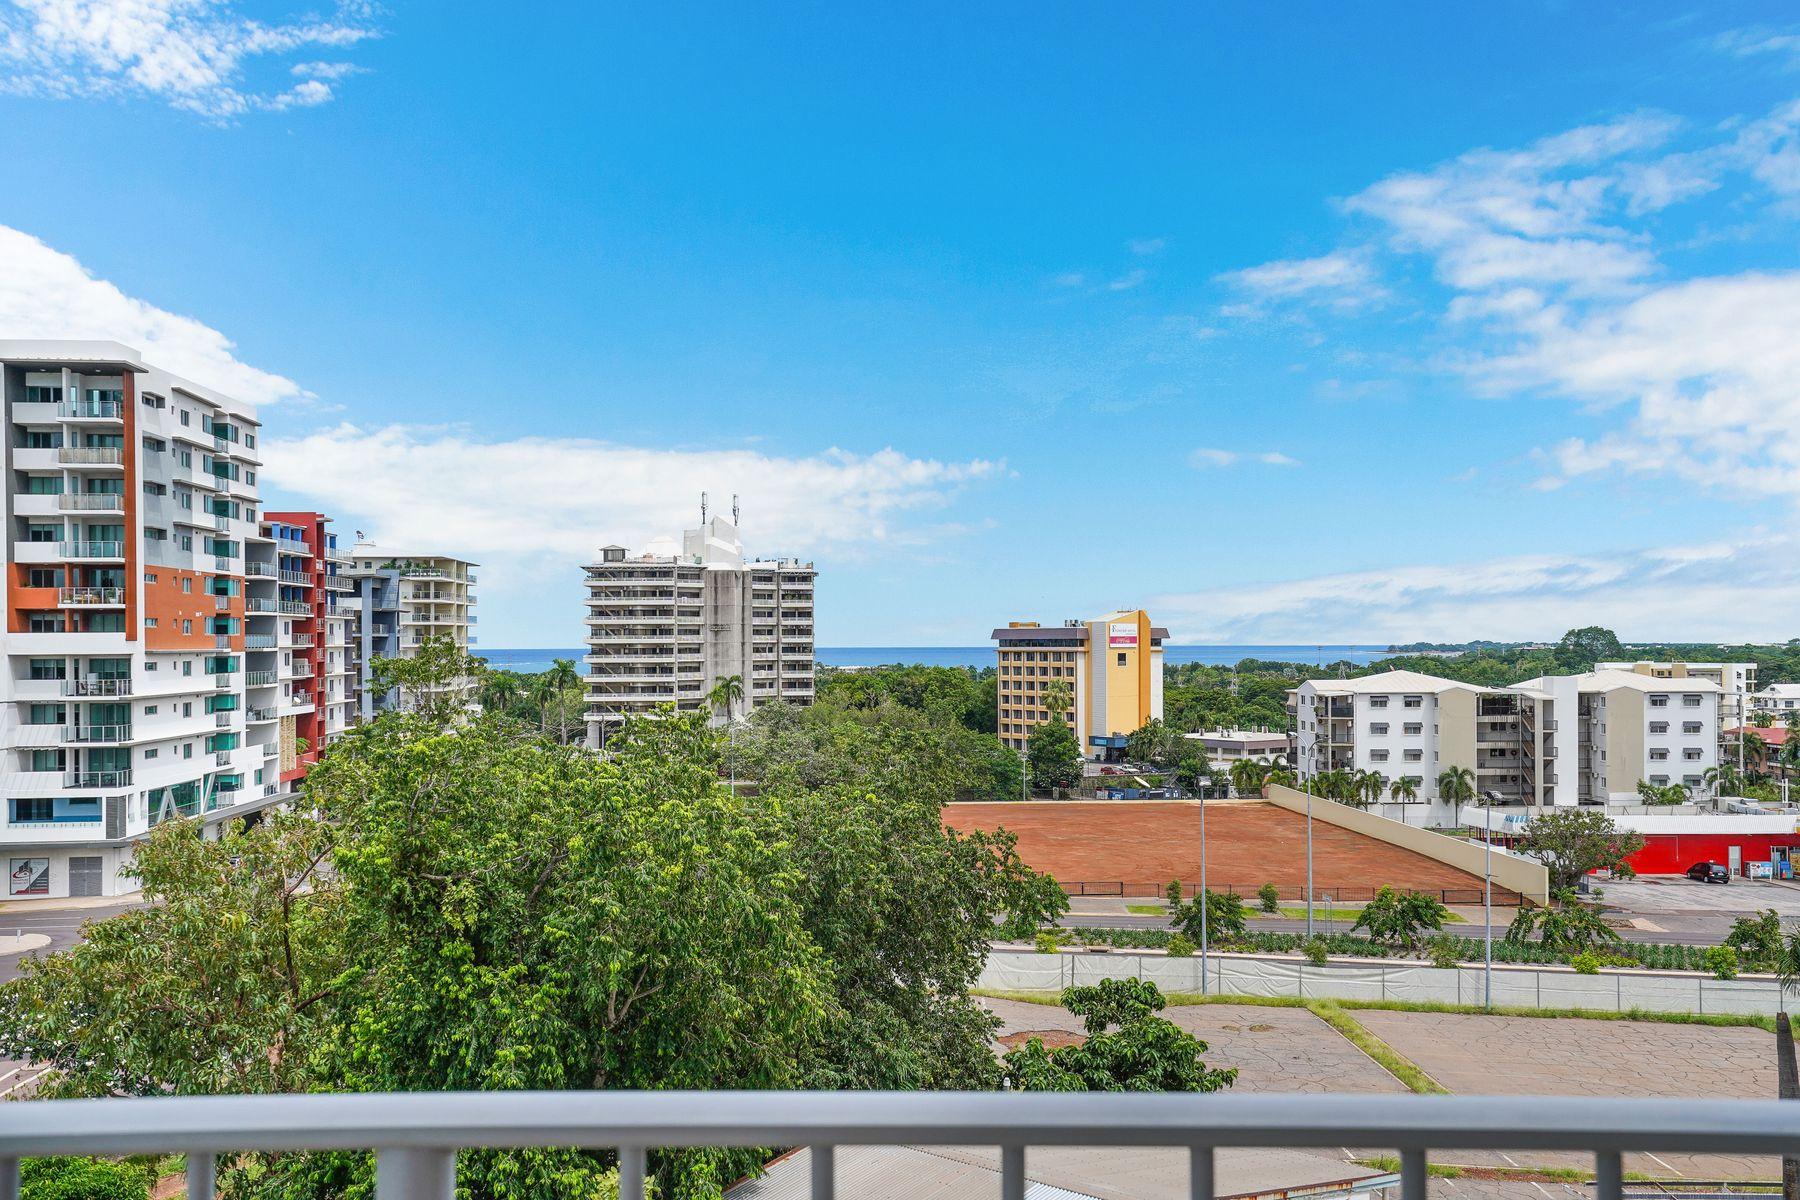 13/96 Woods Street, Darwin City, NT 0800